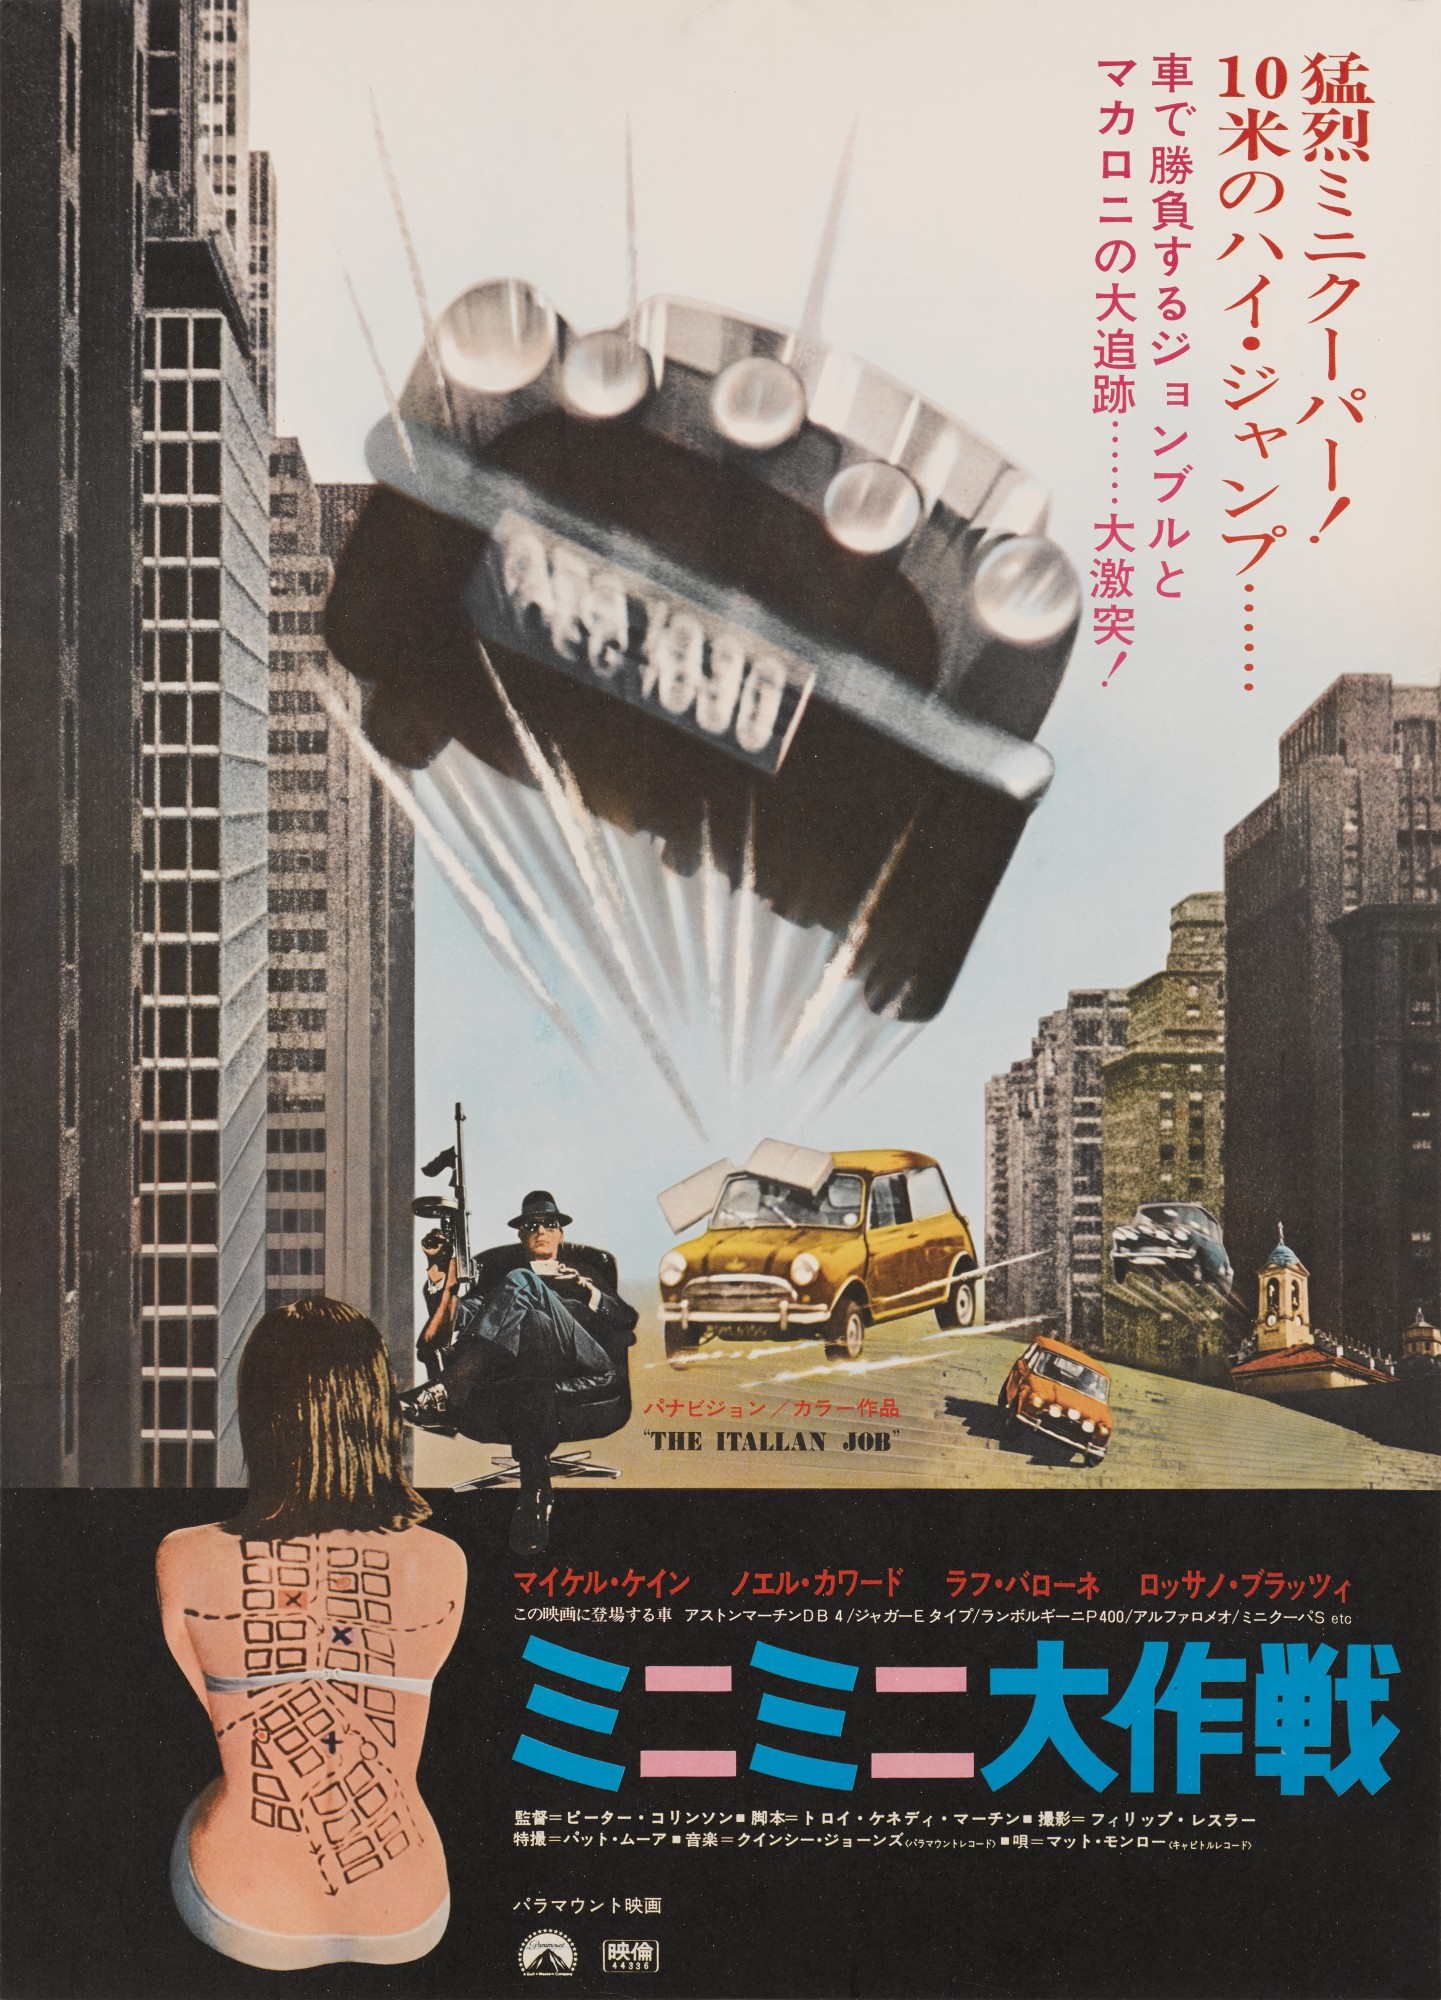 THE ITALIAN JOB (1969) POSTER, JAPANESE